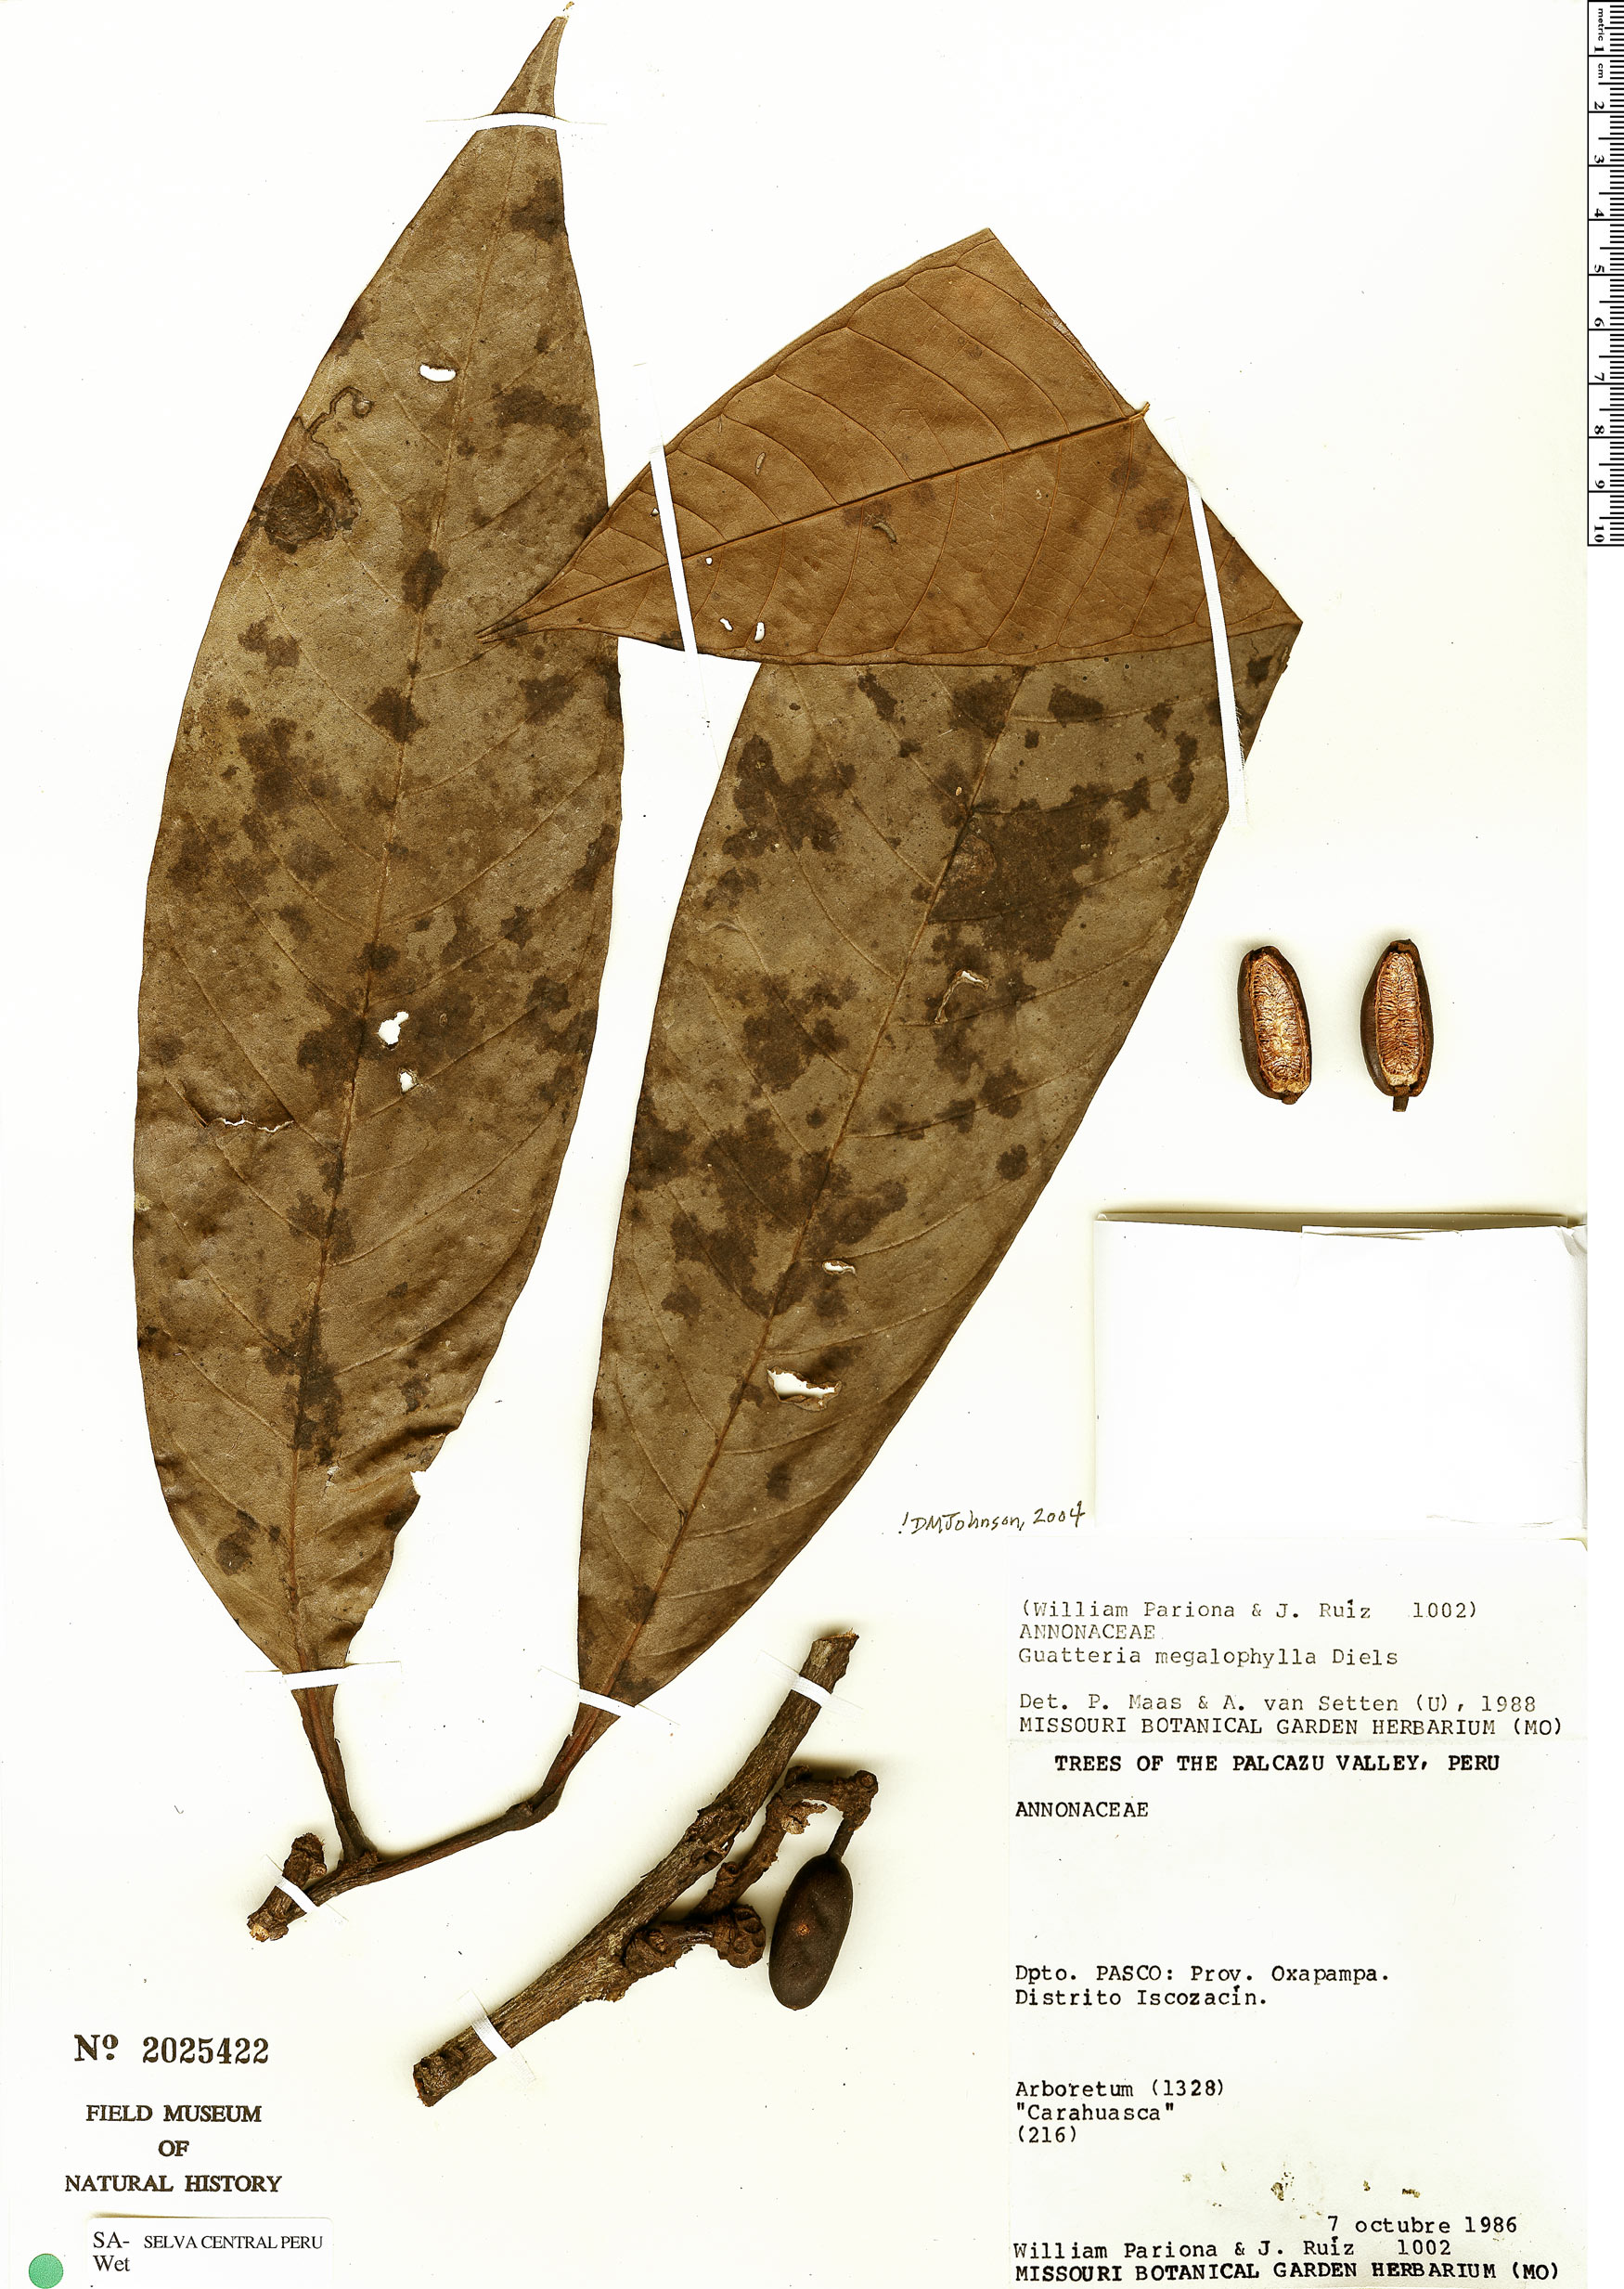 Specimen: Guatteria megalophylla